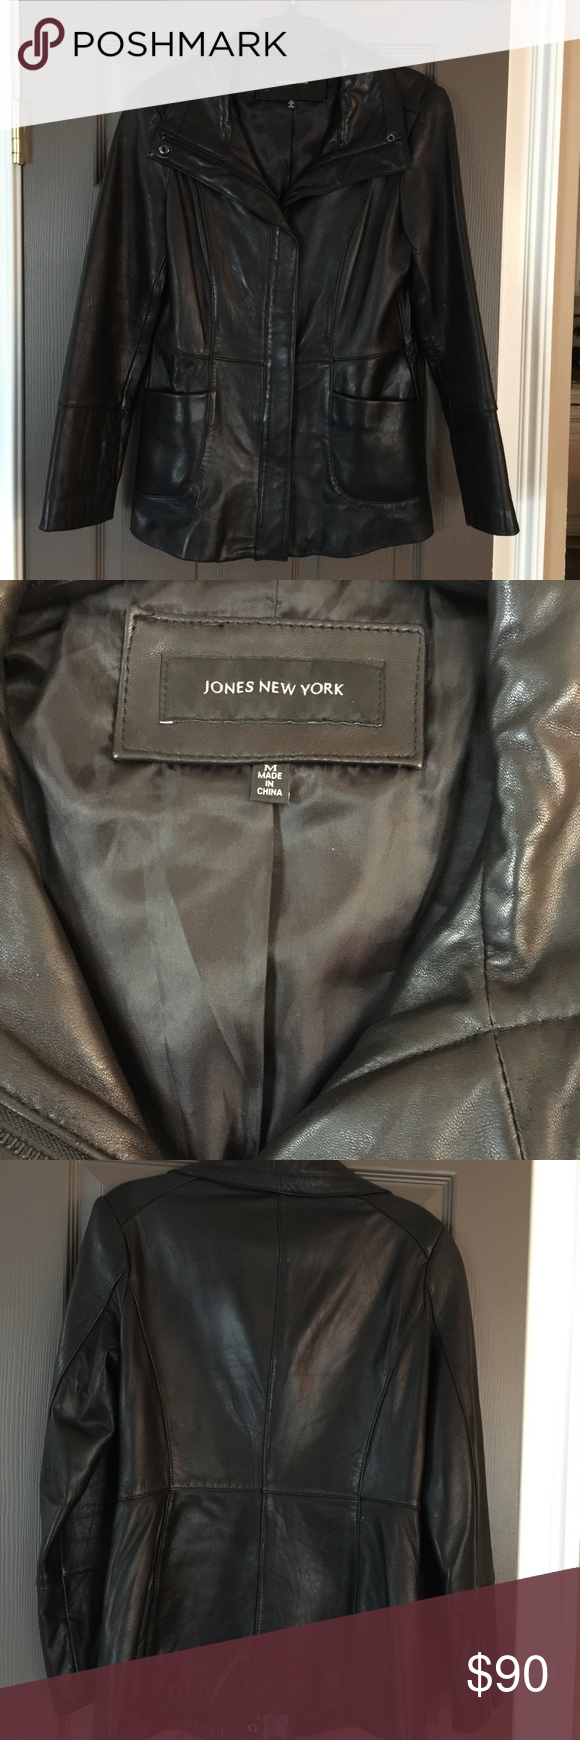 Jones New York Black Leather Jacket Size M Leather Jacket Black Leather Jacket Jones New York [ 1740 x 580 Pixel ]